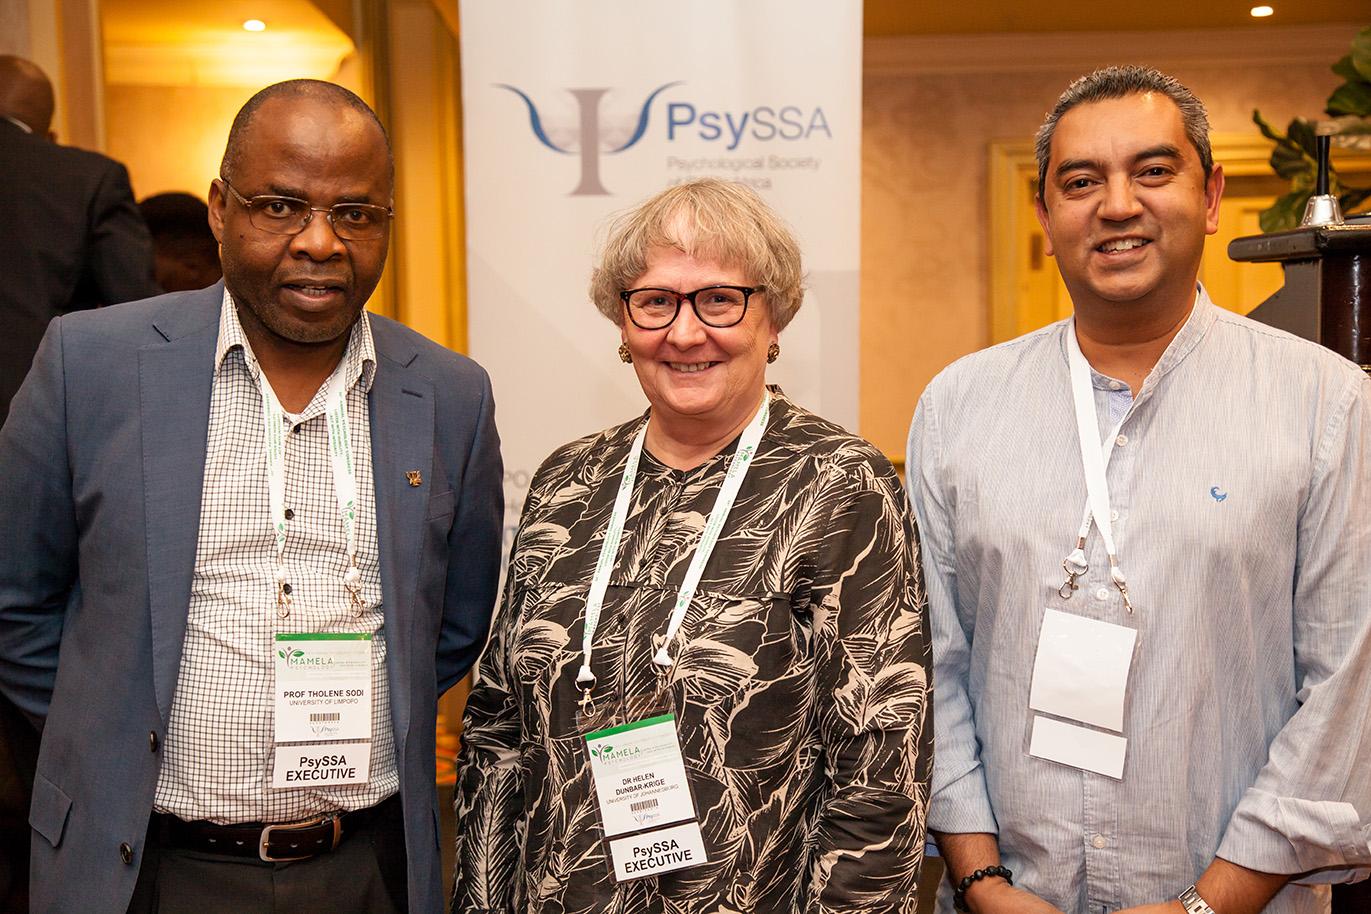 PsySSA Presidency: Prof Sodi (Past President), Dr Dunbar-Krige (PsySSA President), Prof Stevens (President Elect)